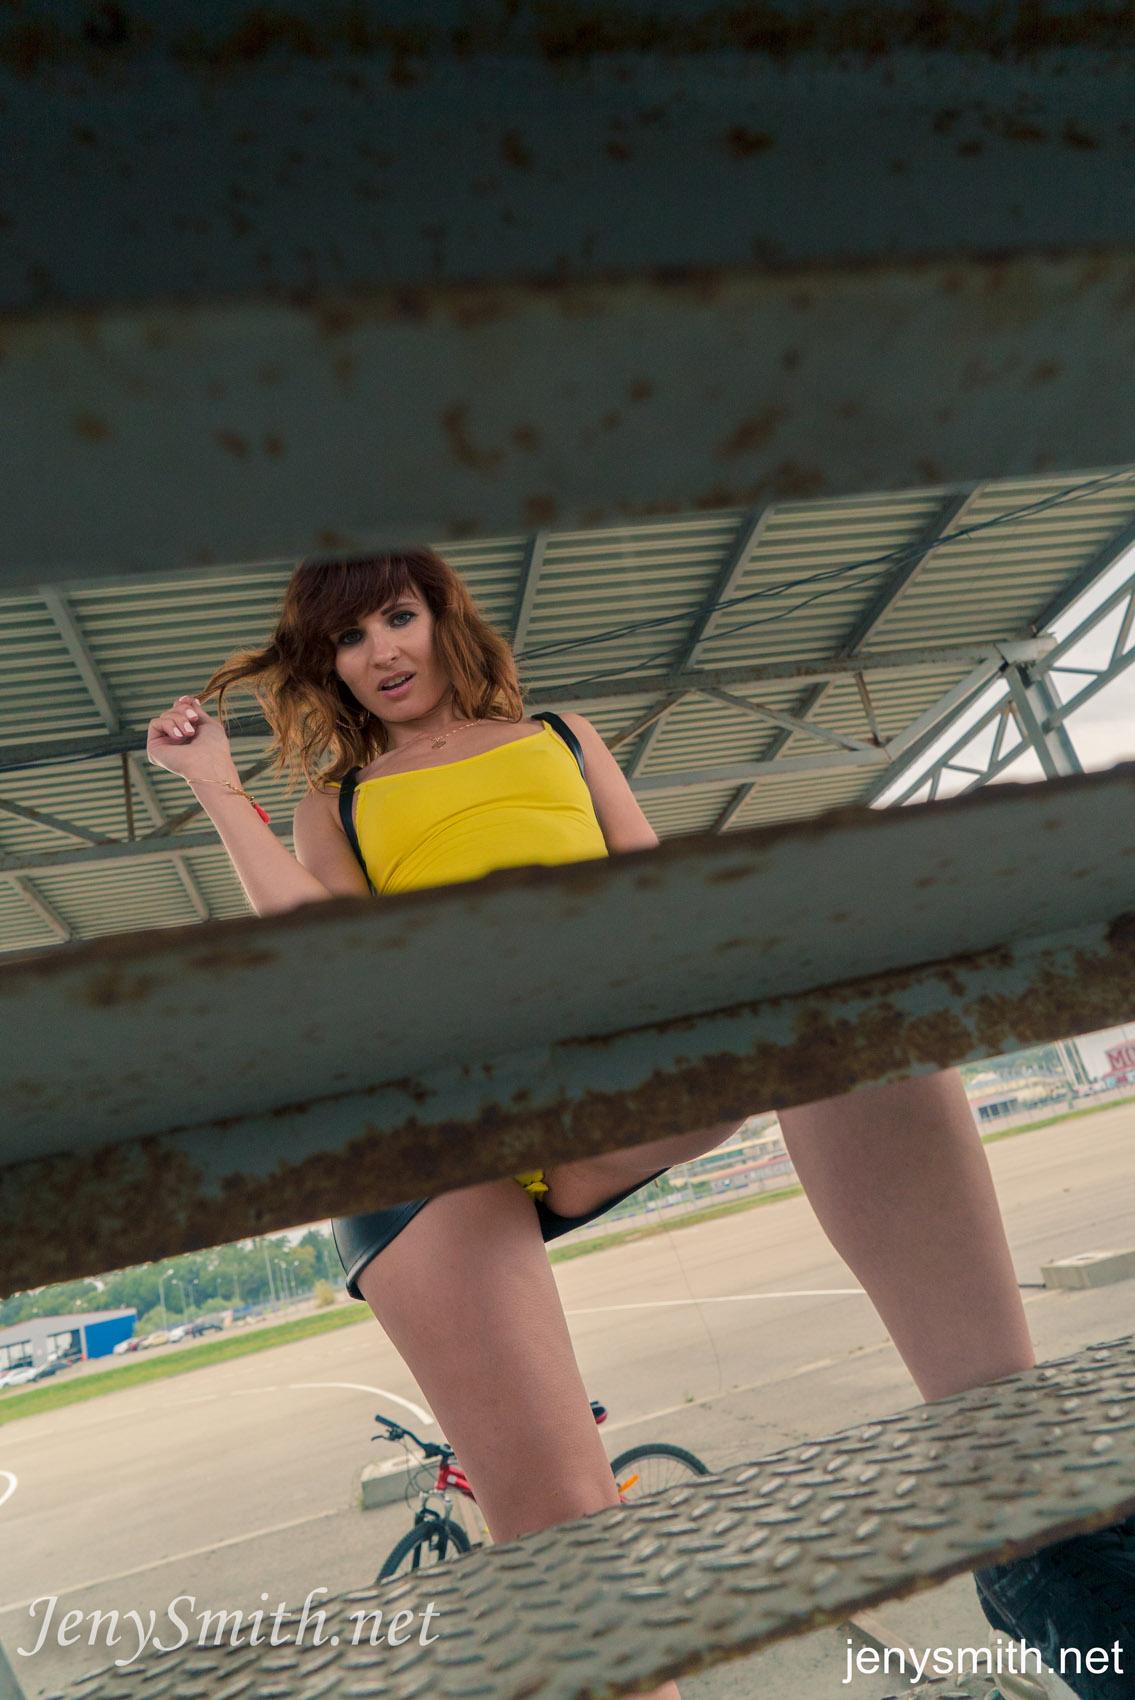 Jeny Smith Upskirt No Panties